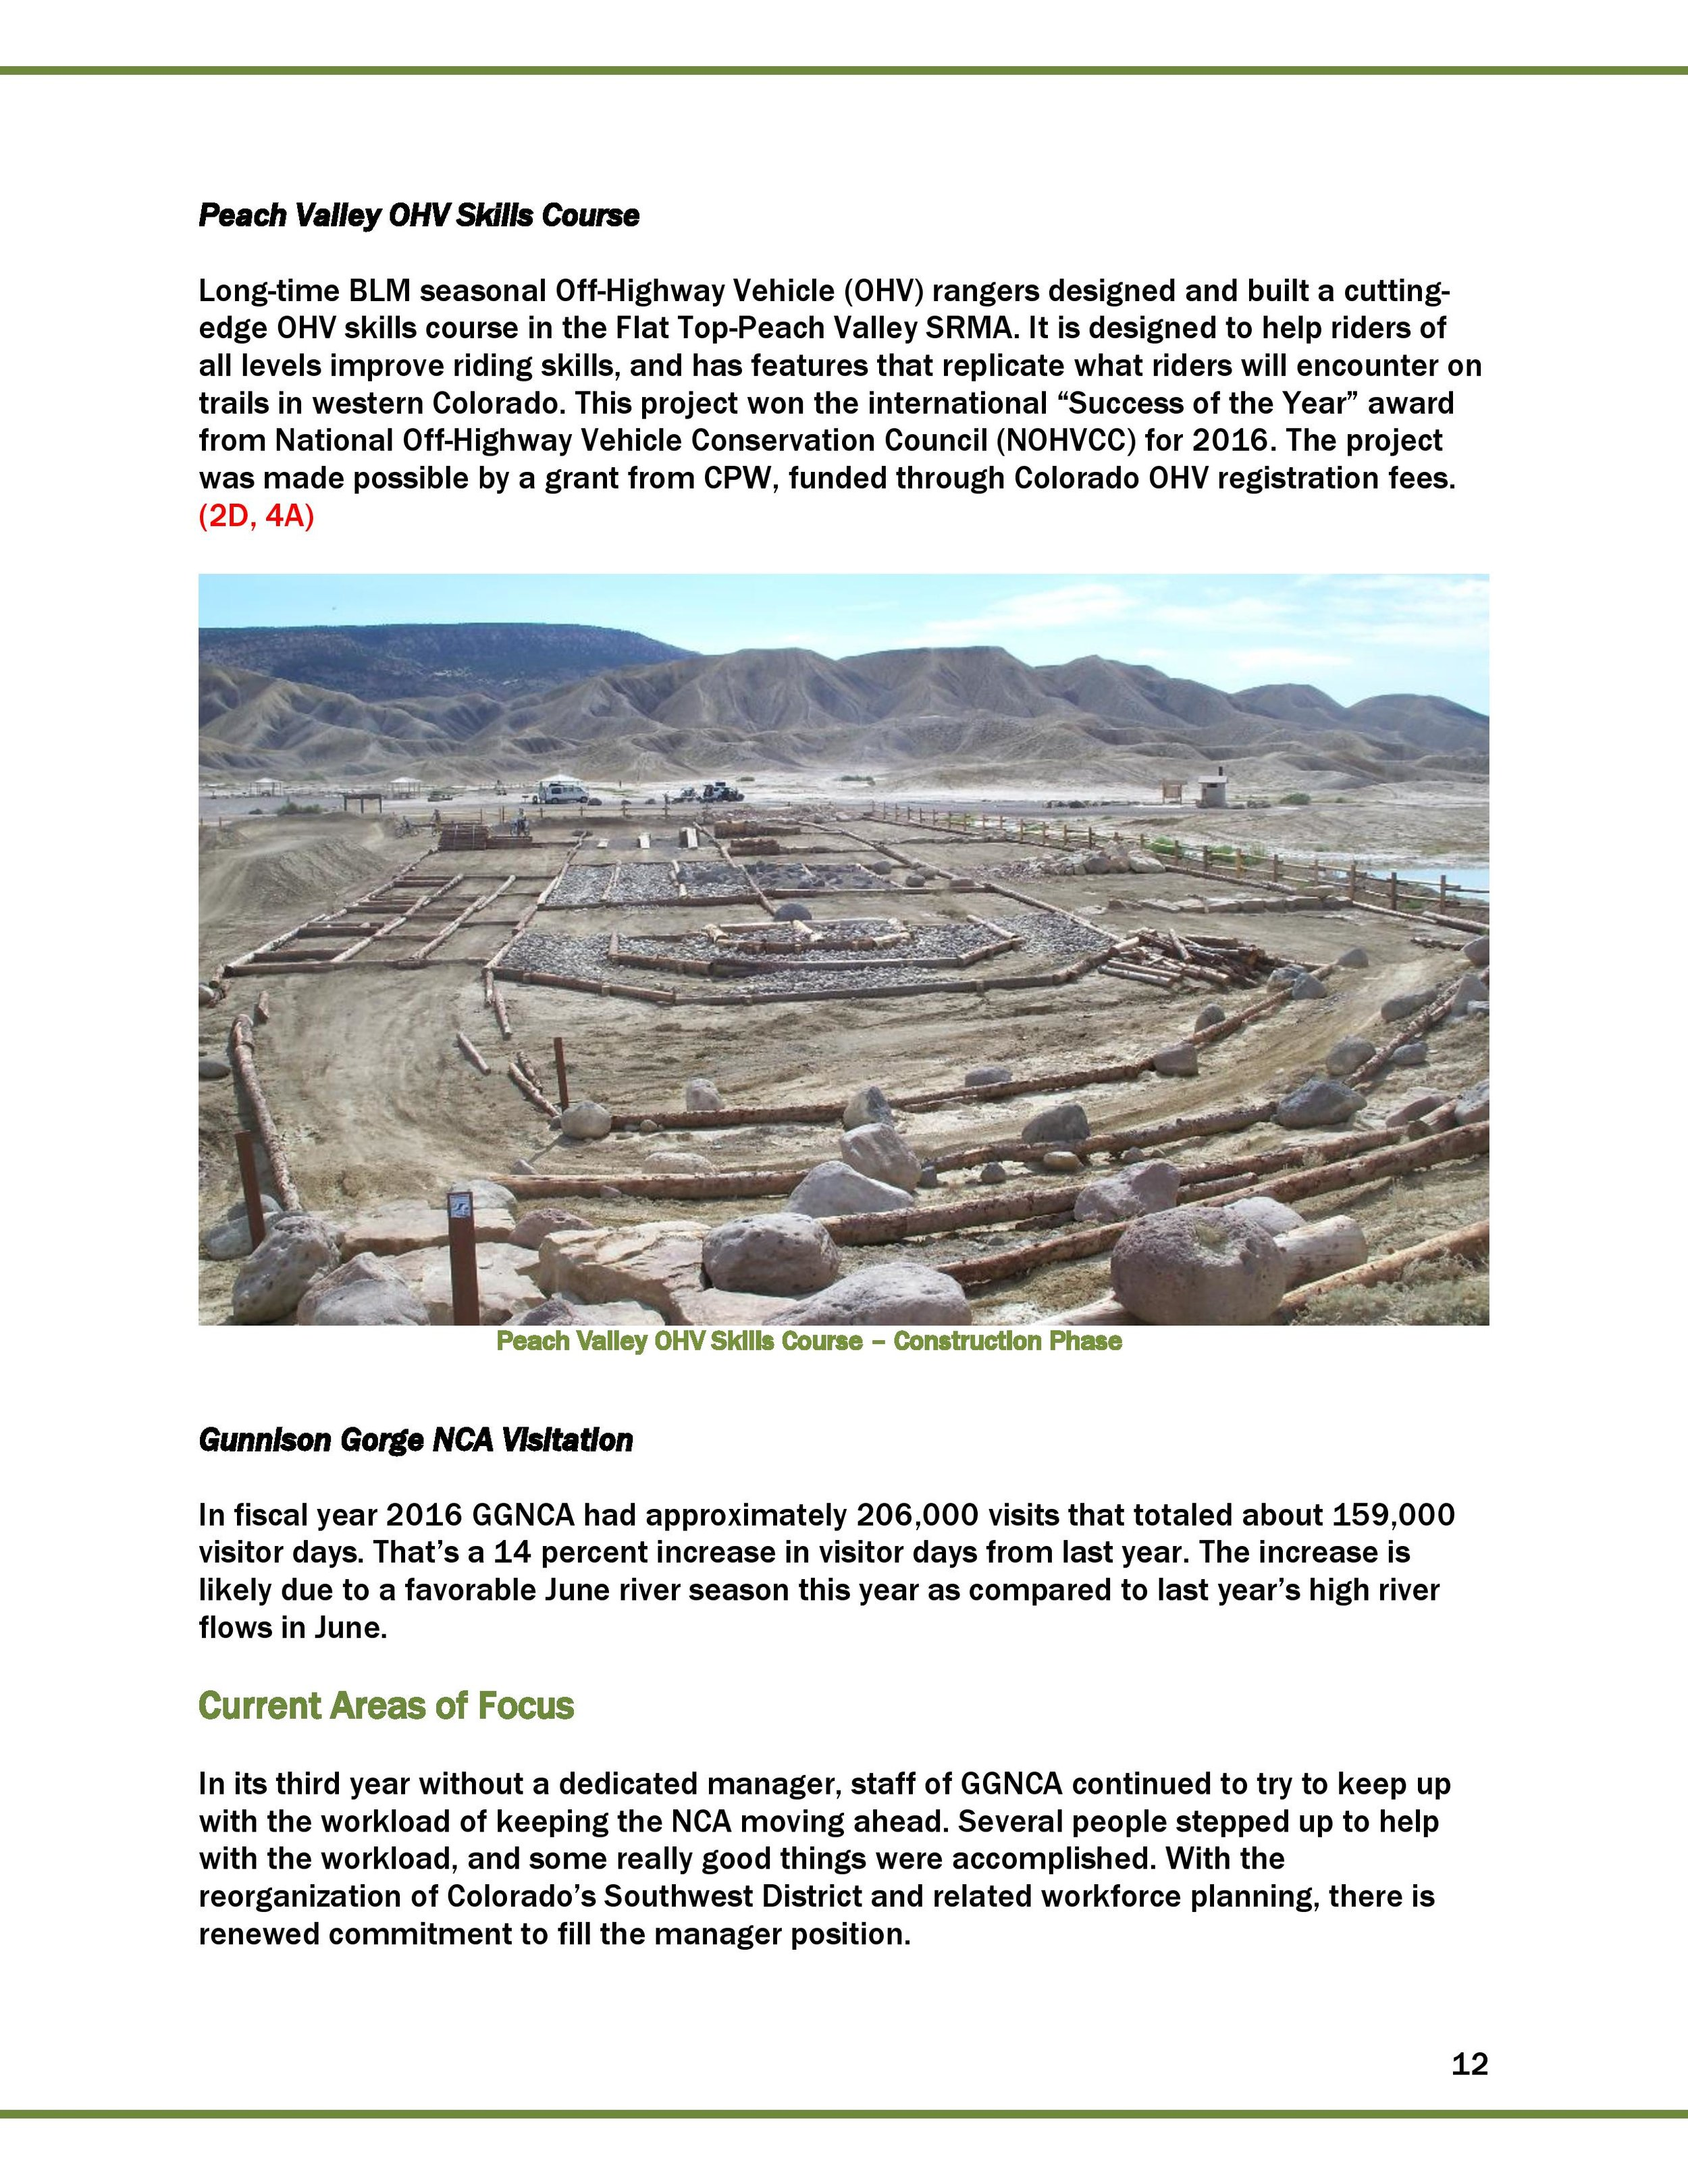 2016 FINAL GGNCA REPORT_2017_02_01-page-013.jpg